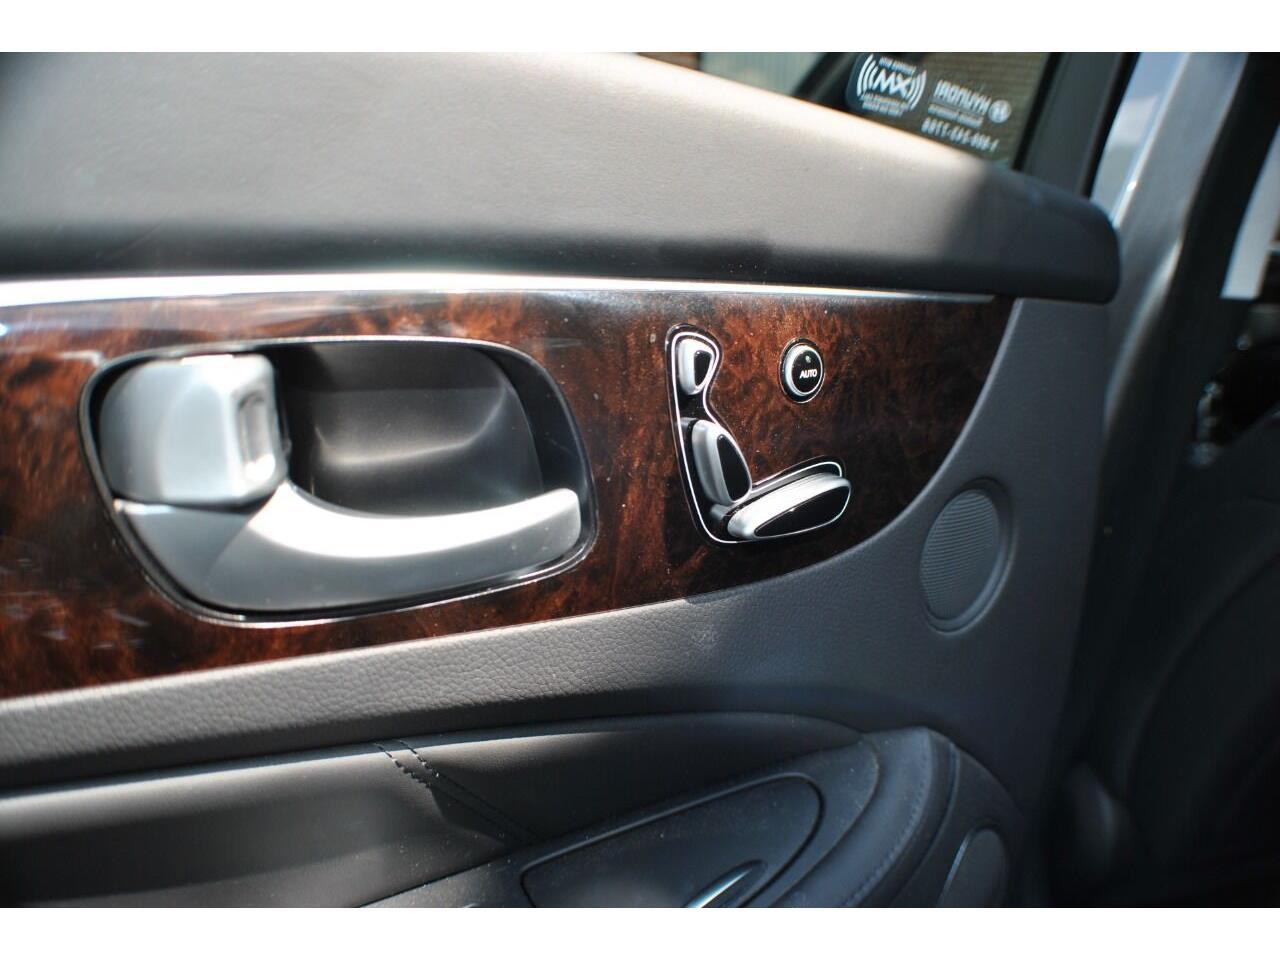 2012 Hyundai Equus (CC-1385571) for sale in Charlotte, North Carolina